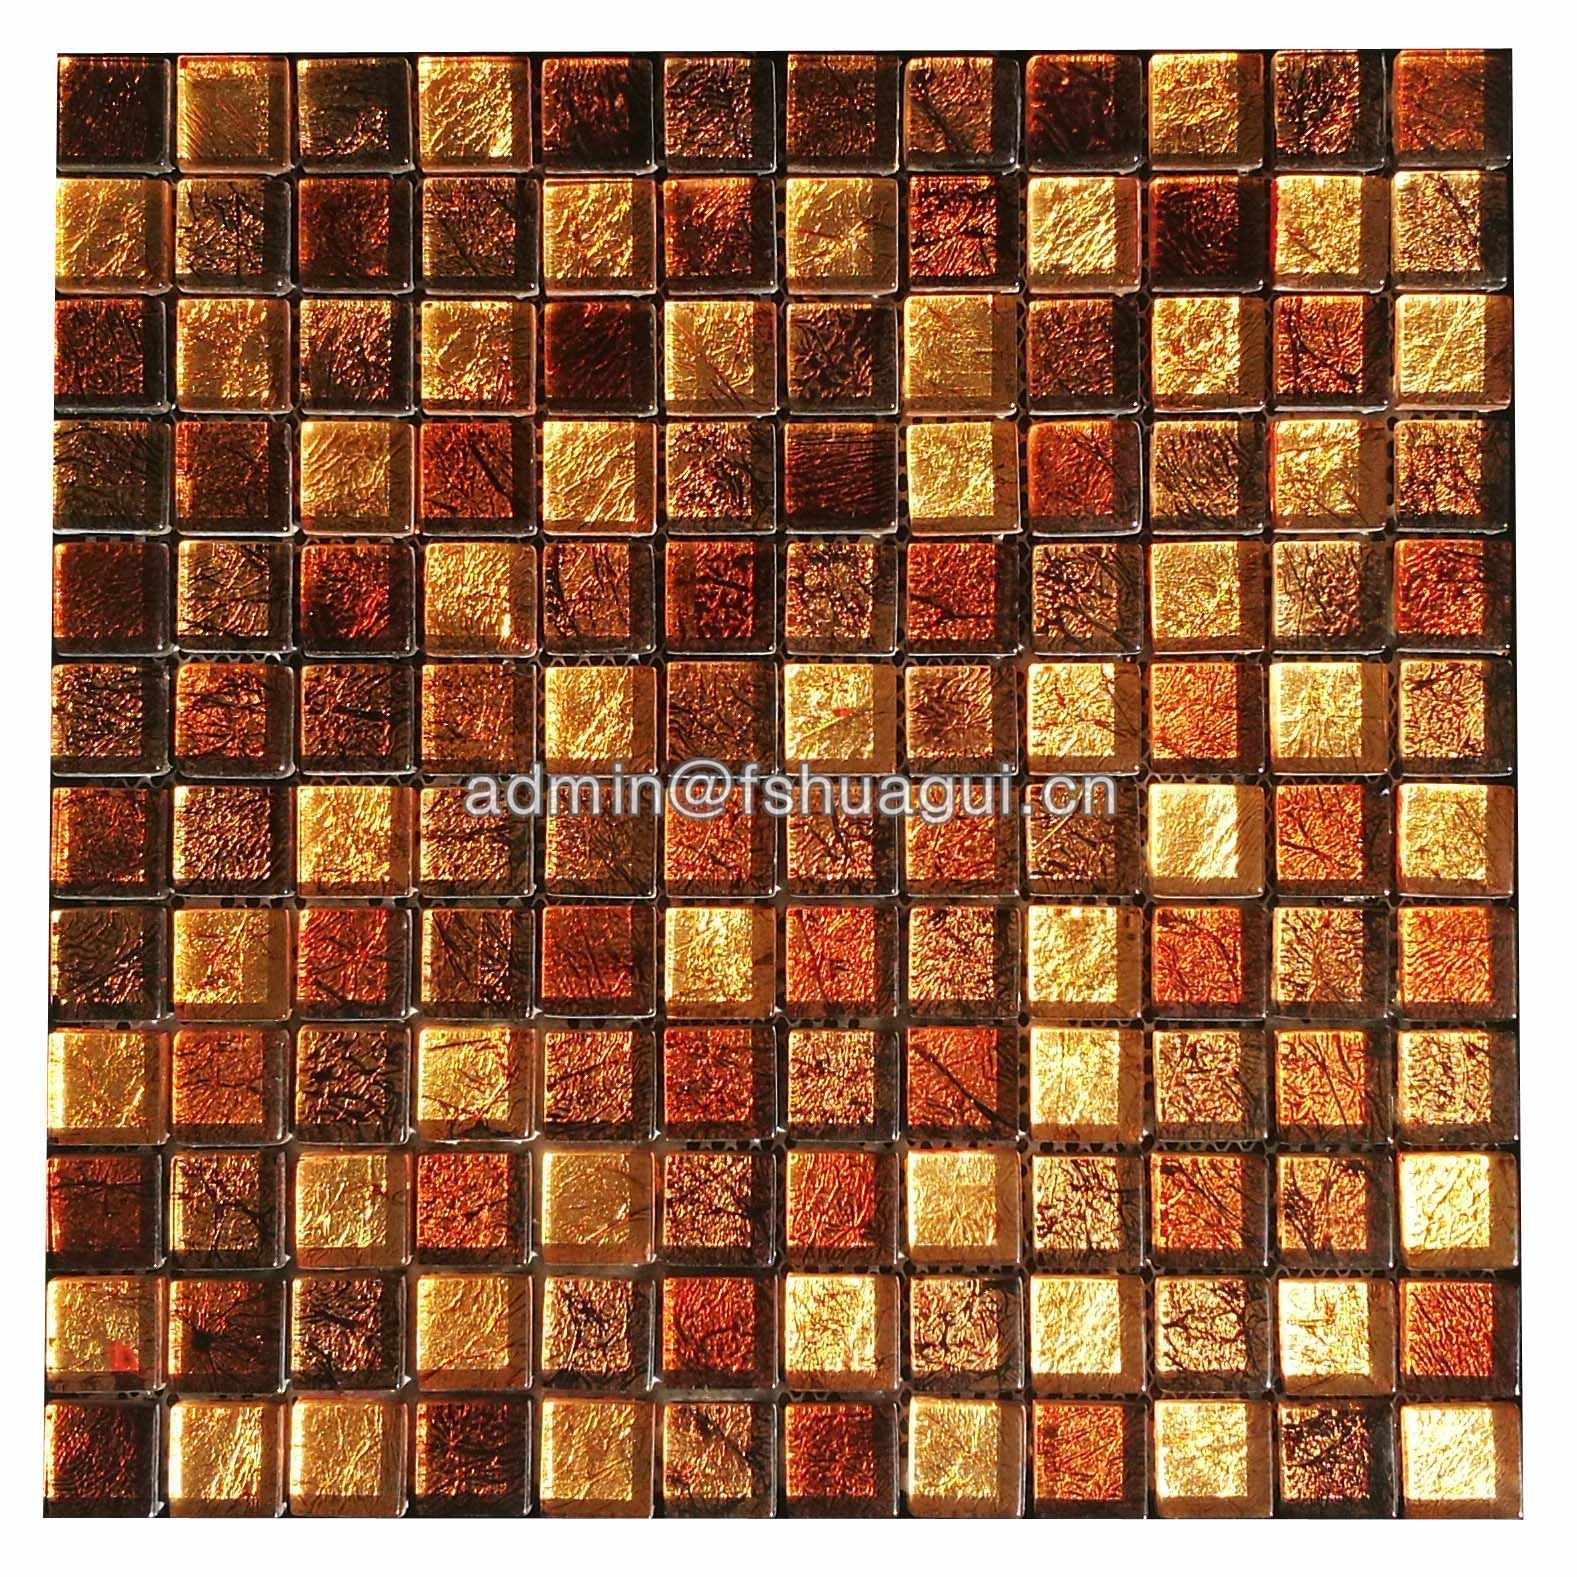 Huagui GLASS MOSAIC HG-HB030 GLASS MOSAIC TILE image105